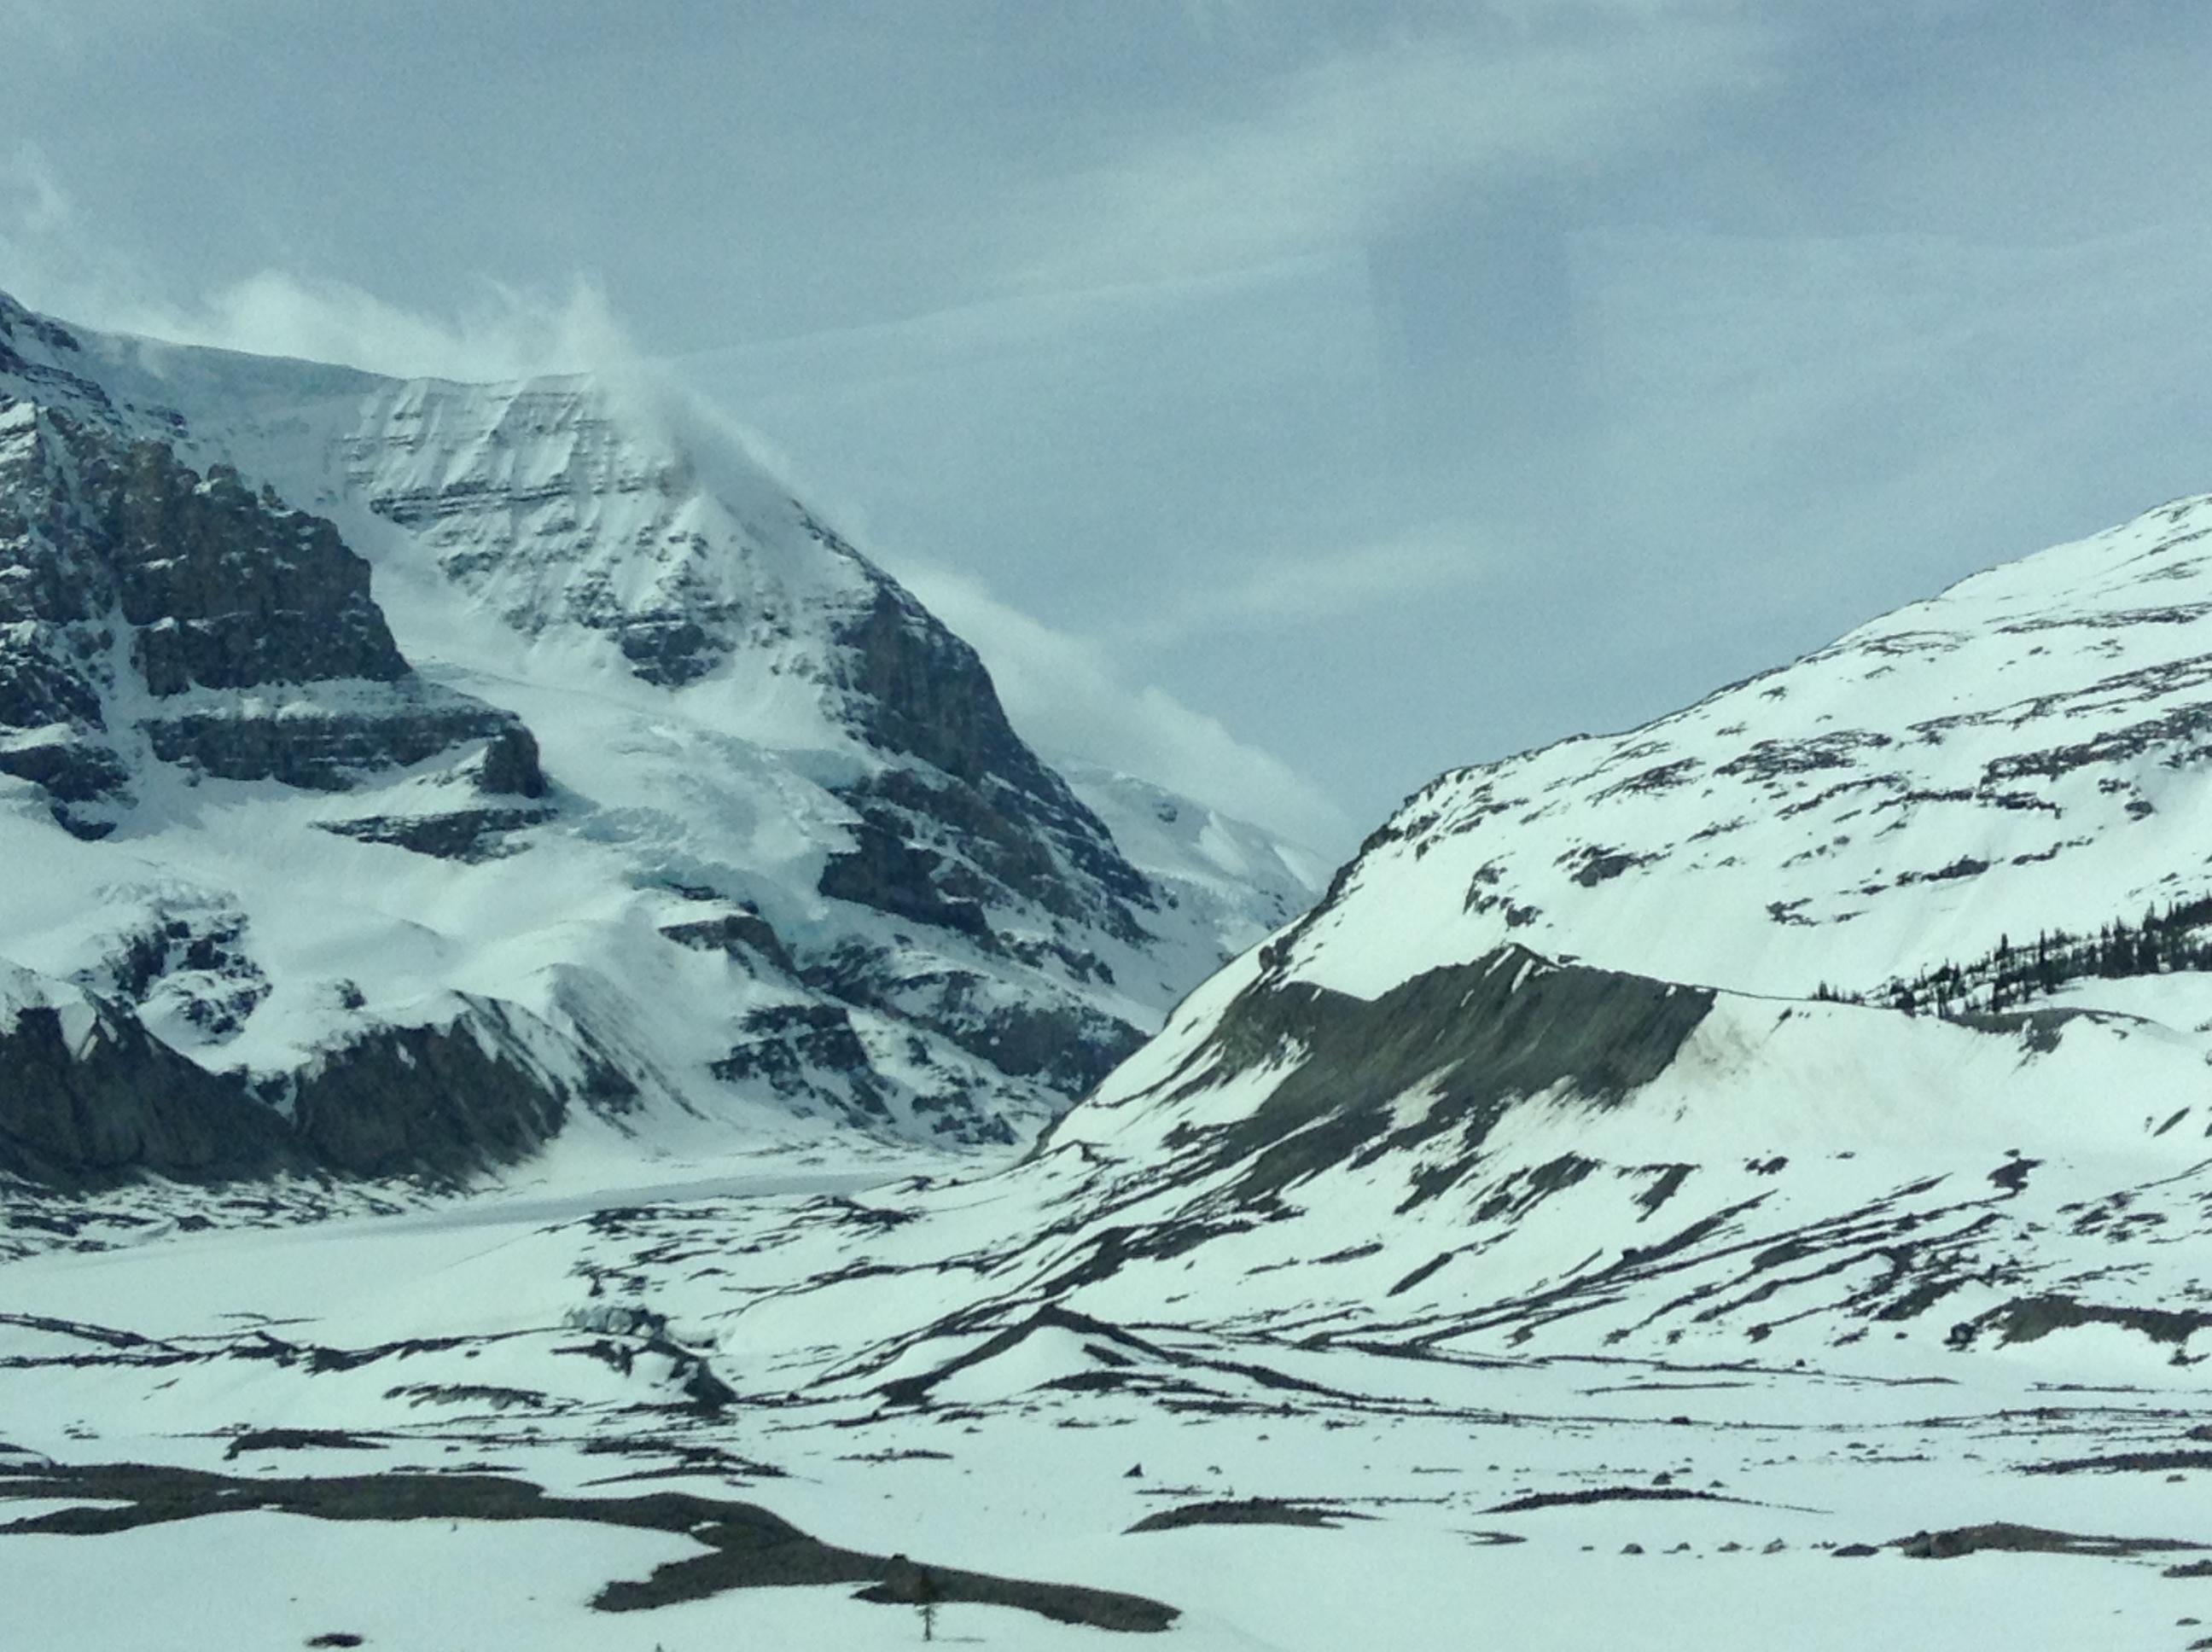 Athabasca Glacier Columbia Icefield Canada